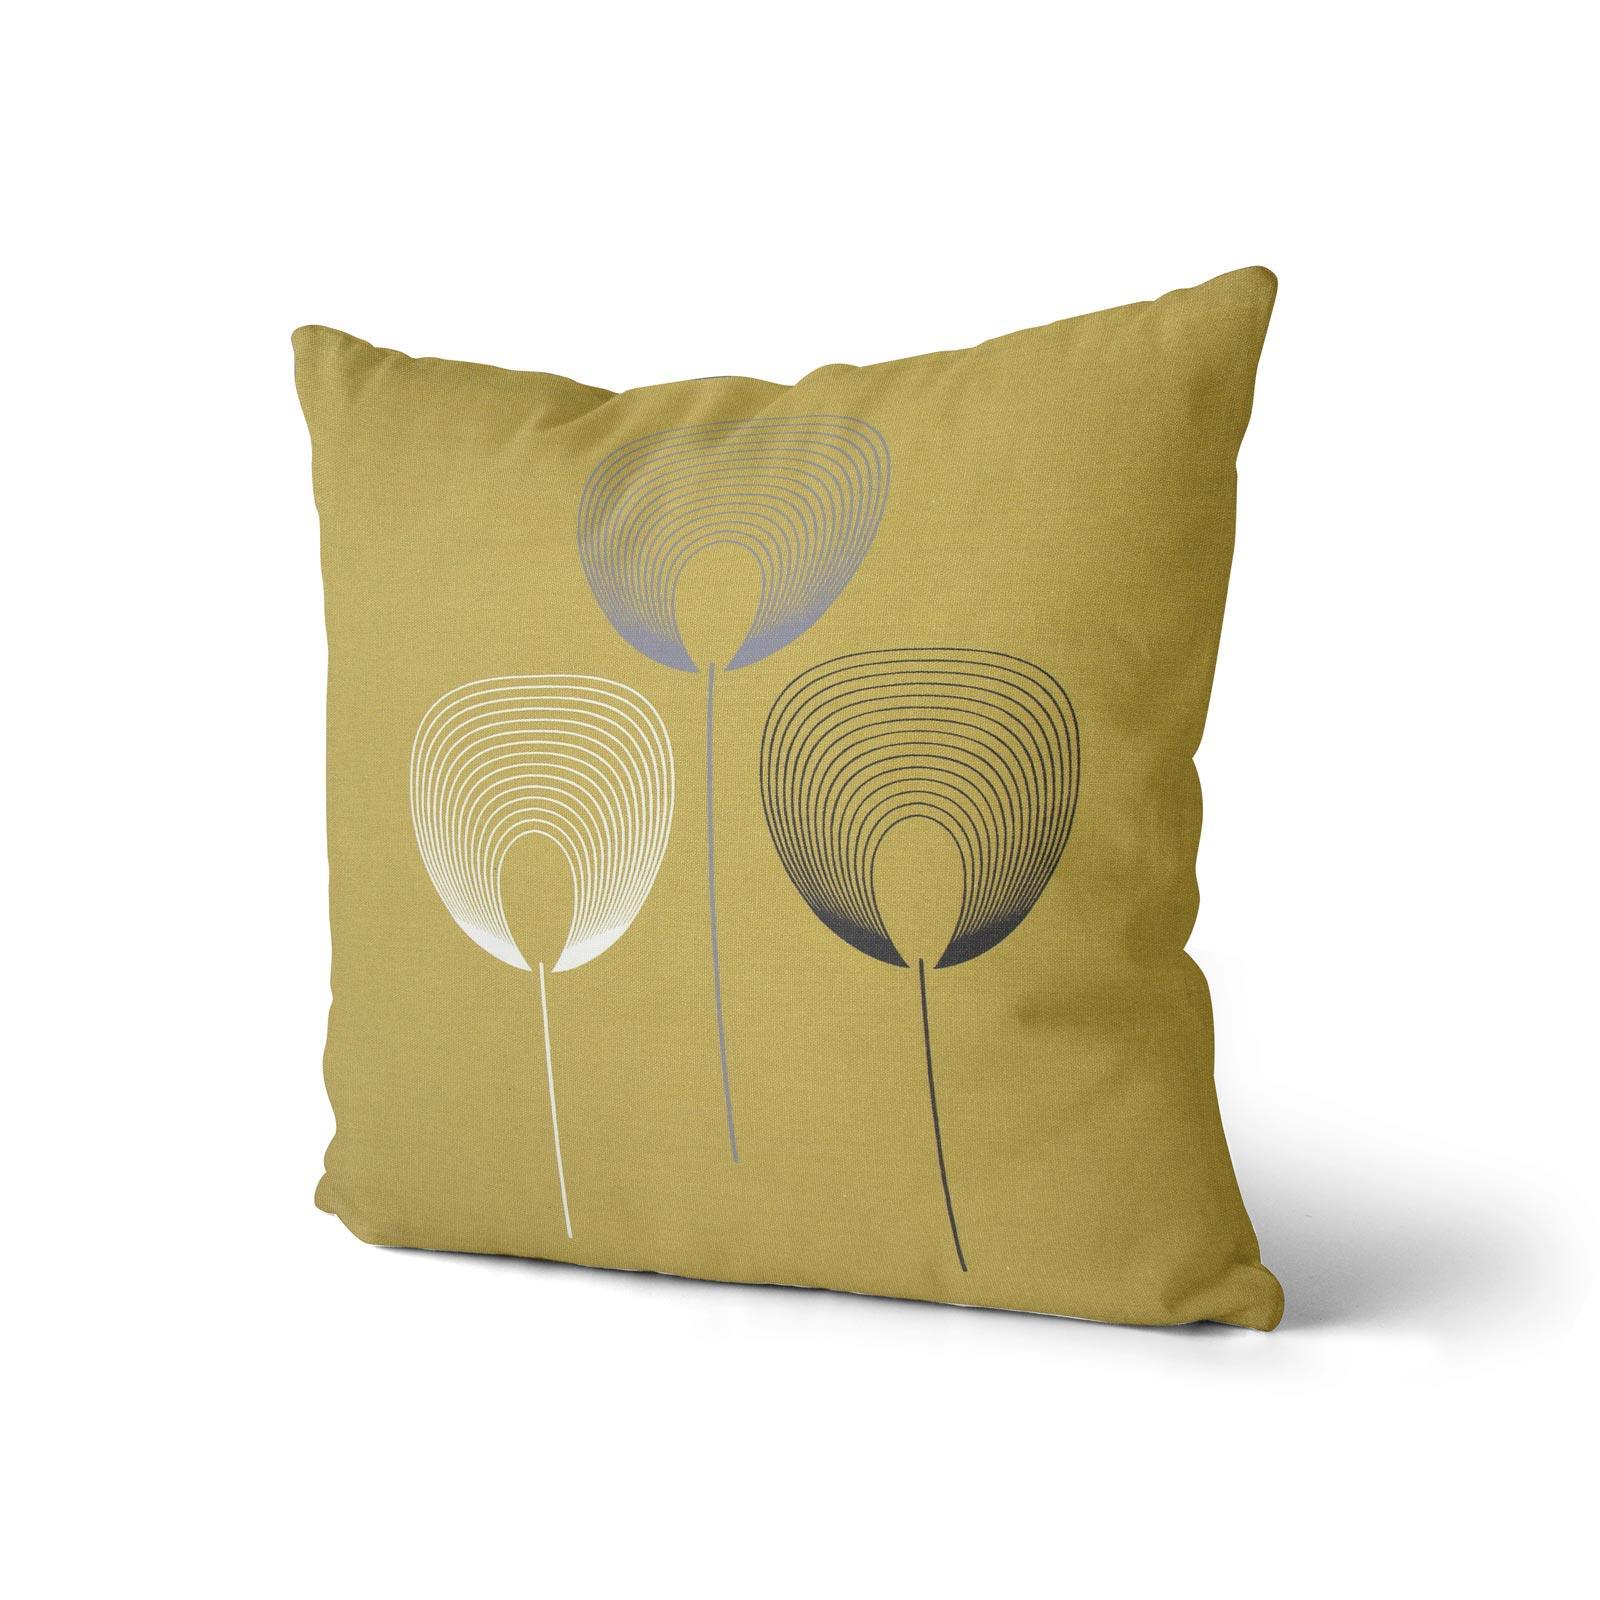 Geometrica-Cushion-Covers-Cojines-De-Impresion-Floral-Gris-Beige-Ocre-cubre-17-034-X-17-034 miniatura 5